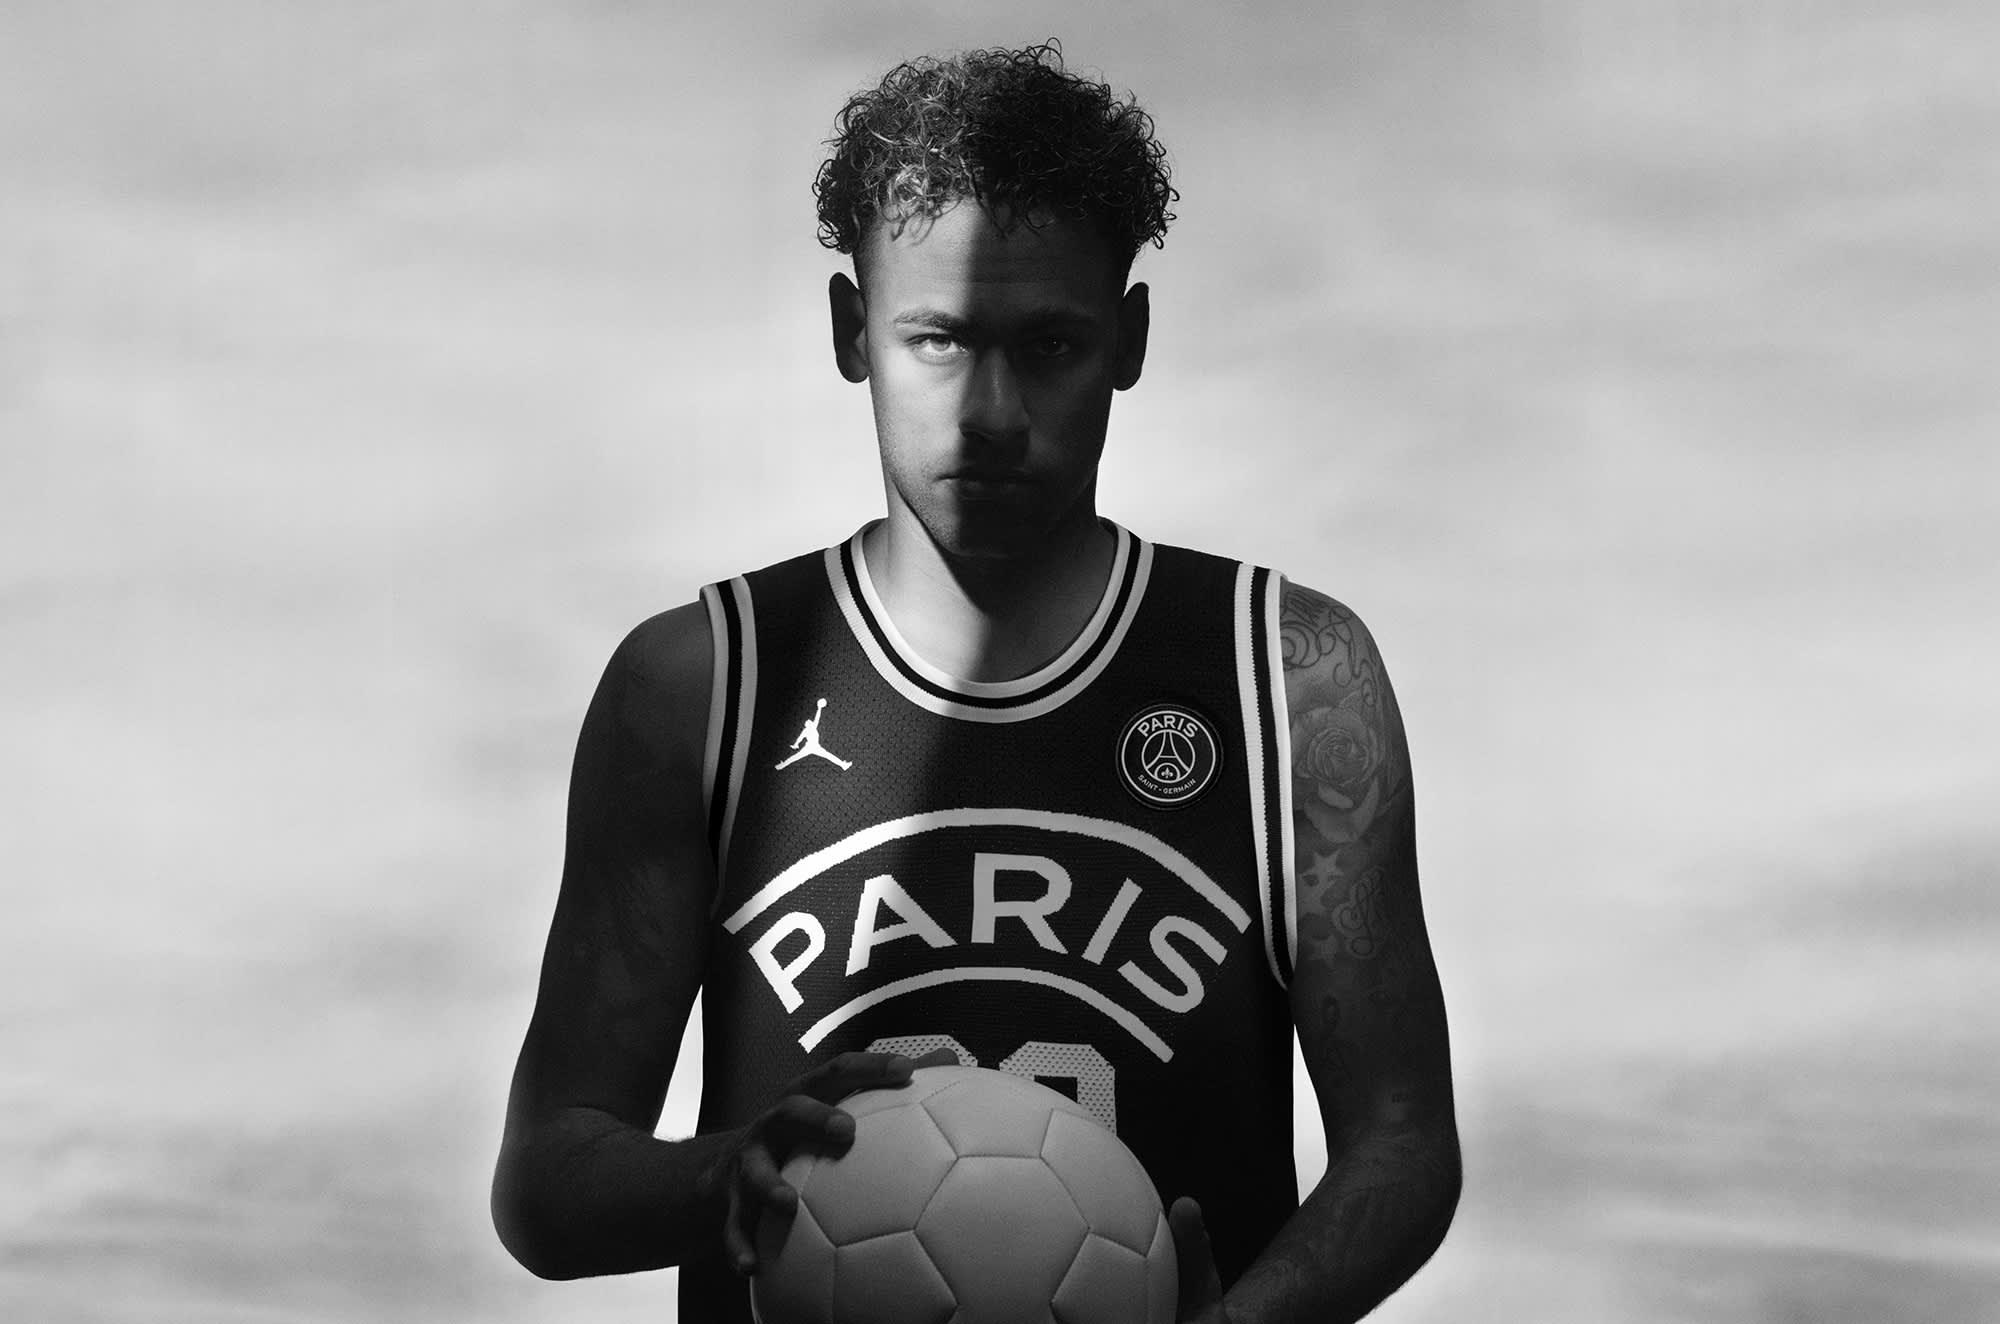 Nike Air Jordans pass basketball with Paris Saint-Germain soccer club